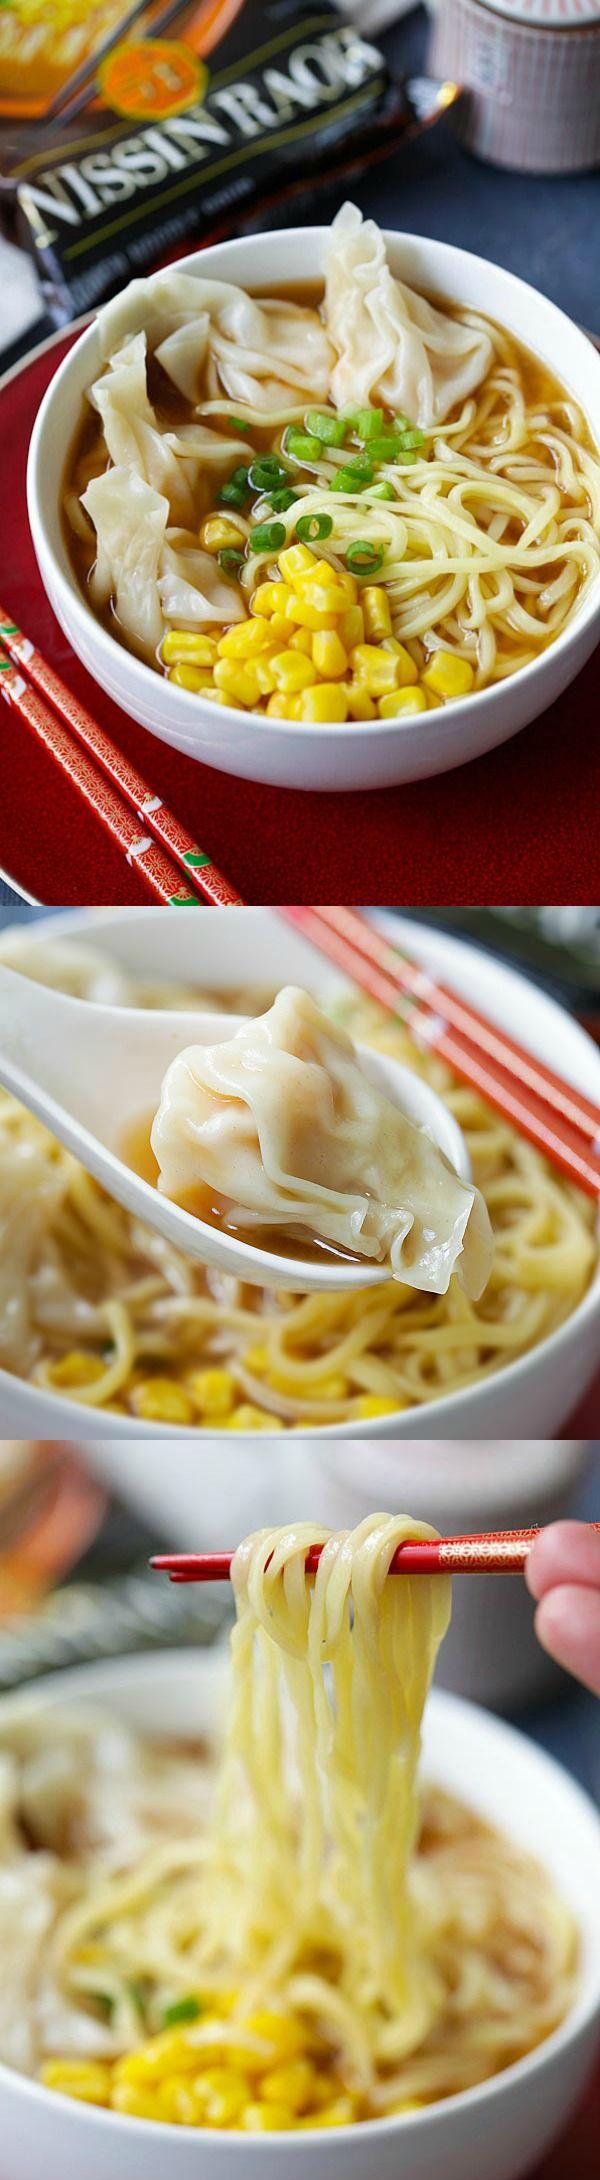 Shrimp Wonton Miso Ramen - restaurant-quality miso ramen with juicy and plump shrimp wontons, made with Nissin RAOH ramen, SO GOOD!   rasamalaysia.com